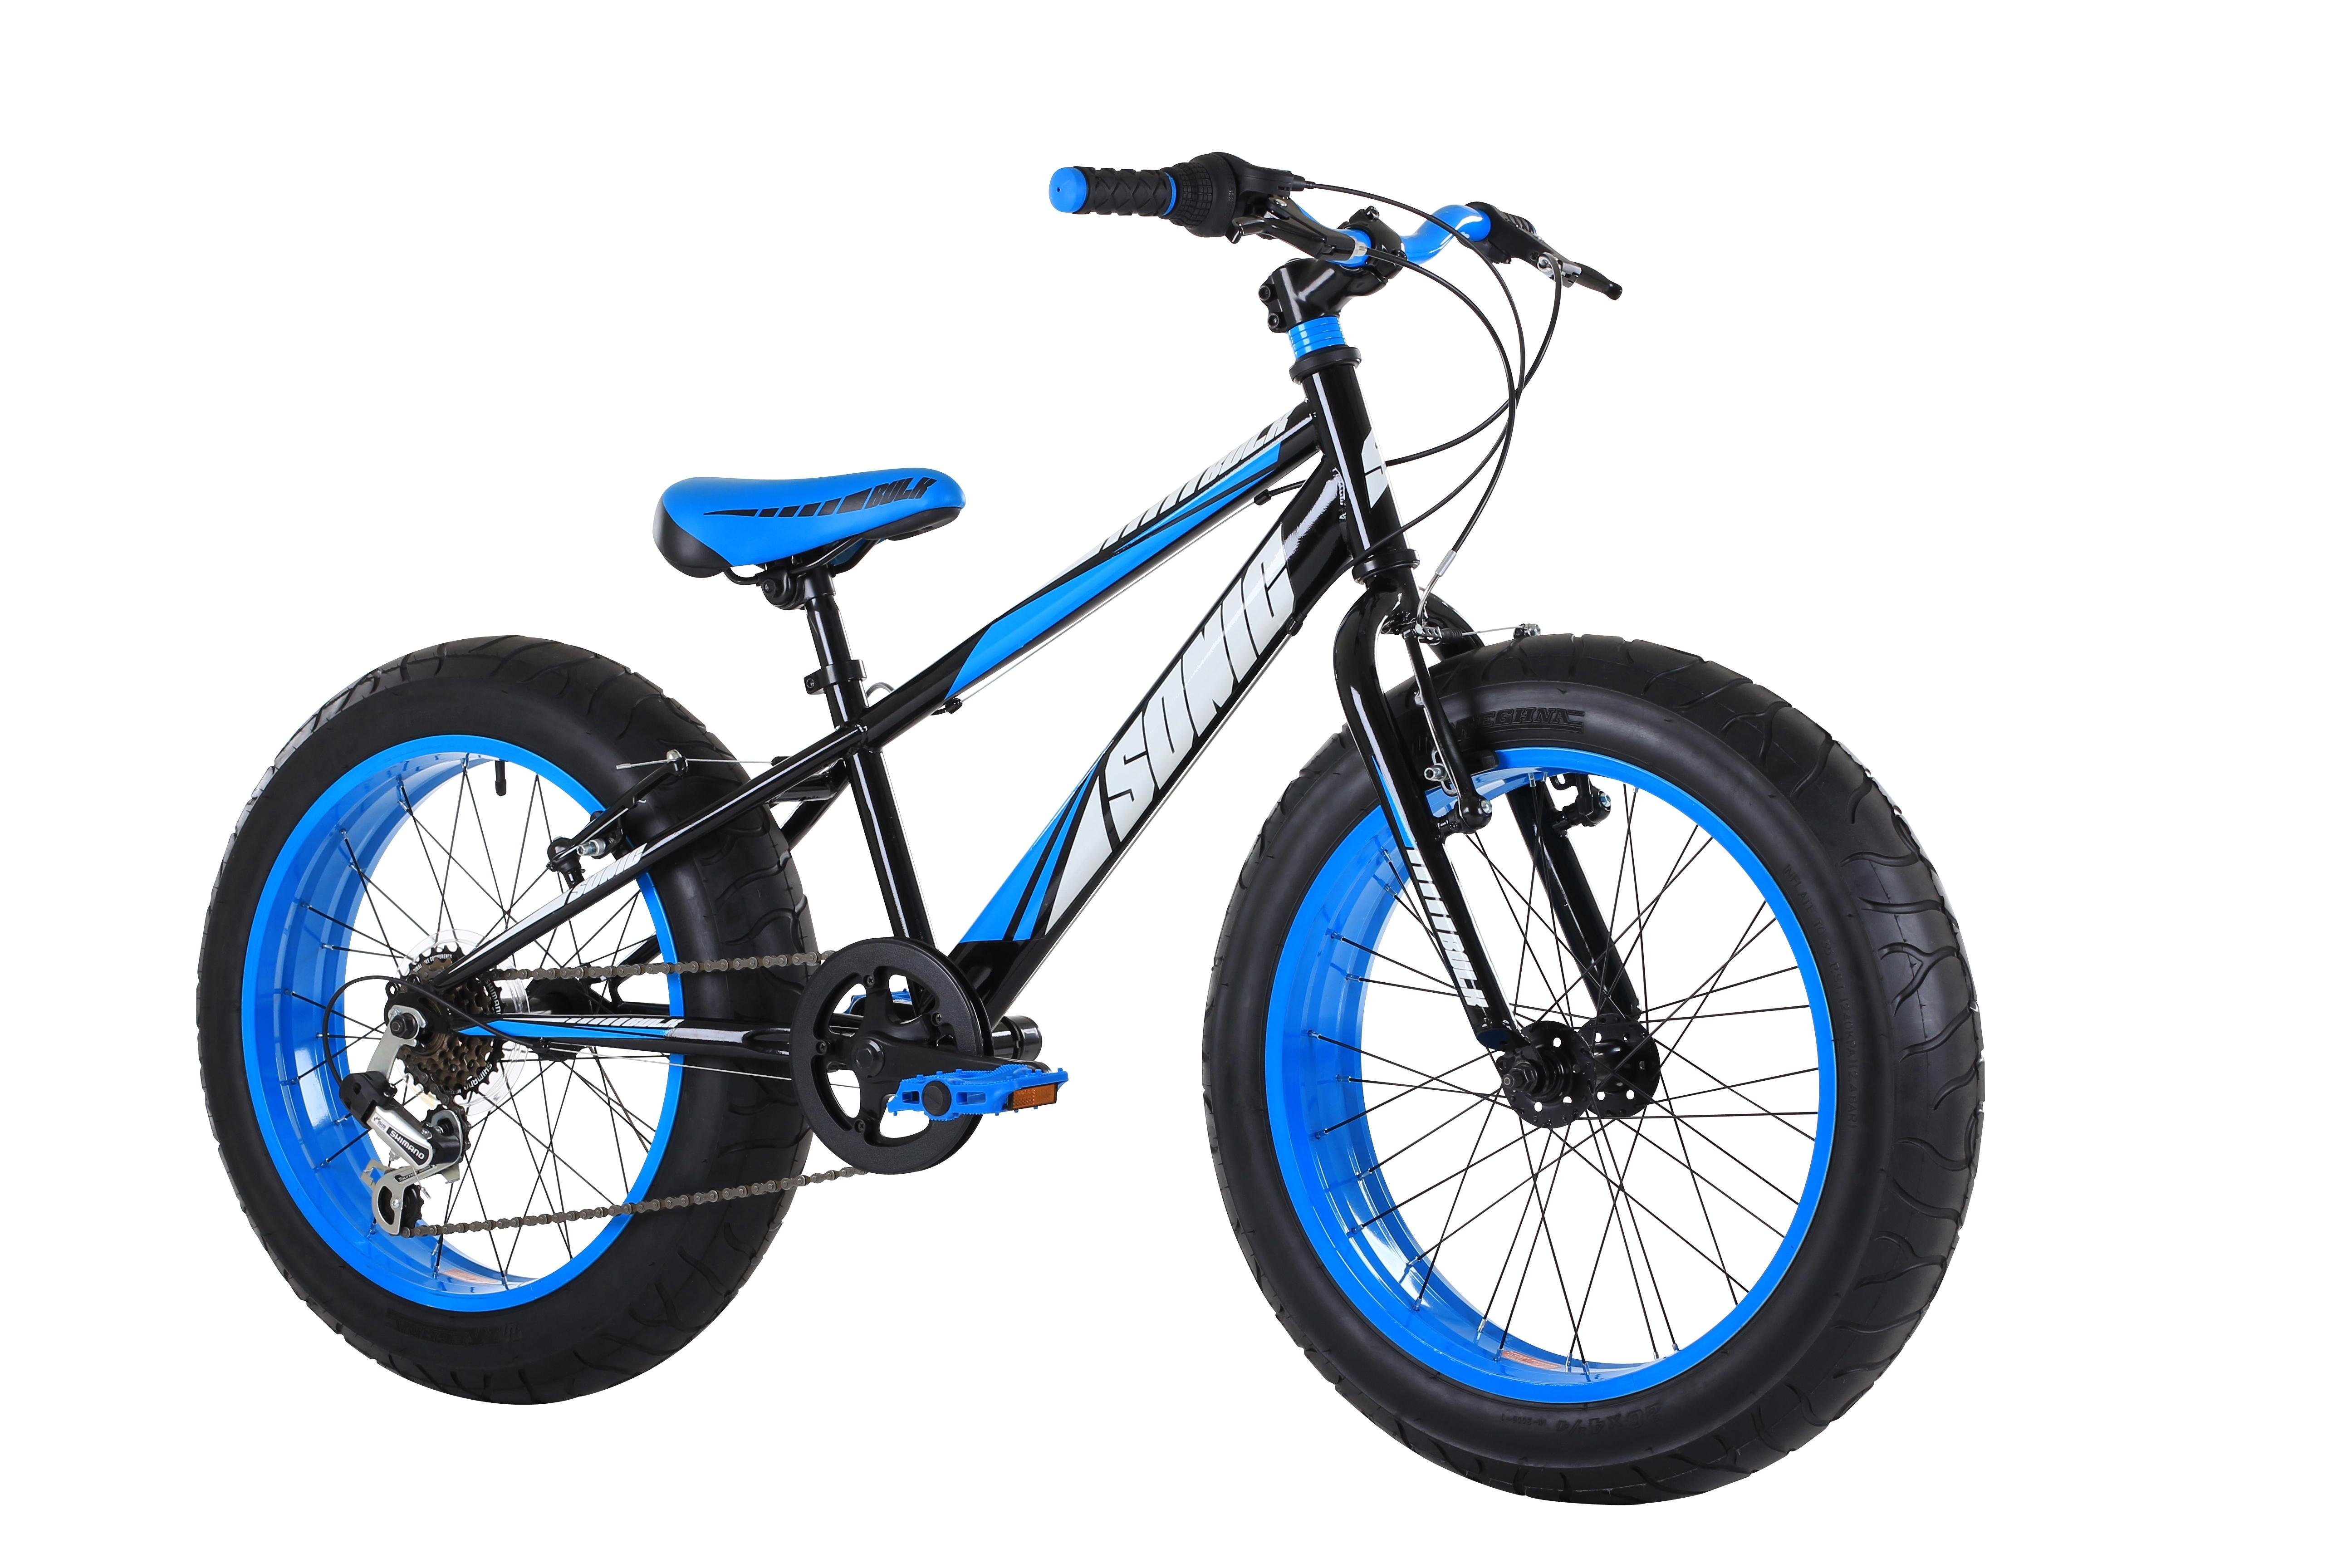 Sonic Bulk Kid S Fat Bike Vivid Blue Amazon Co Uk Sports Outdoors